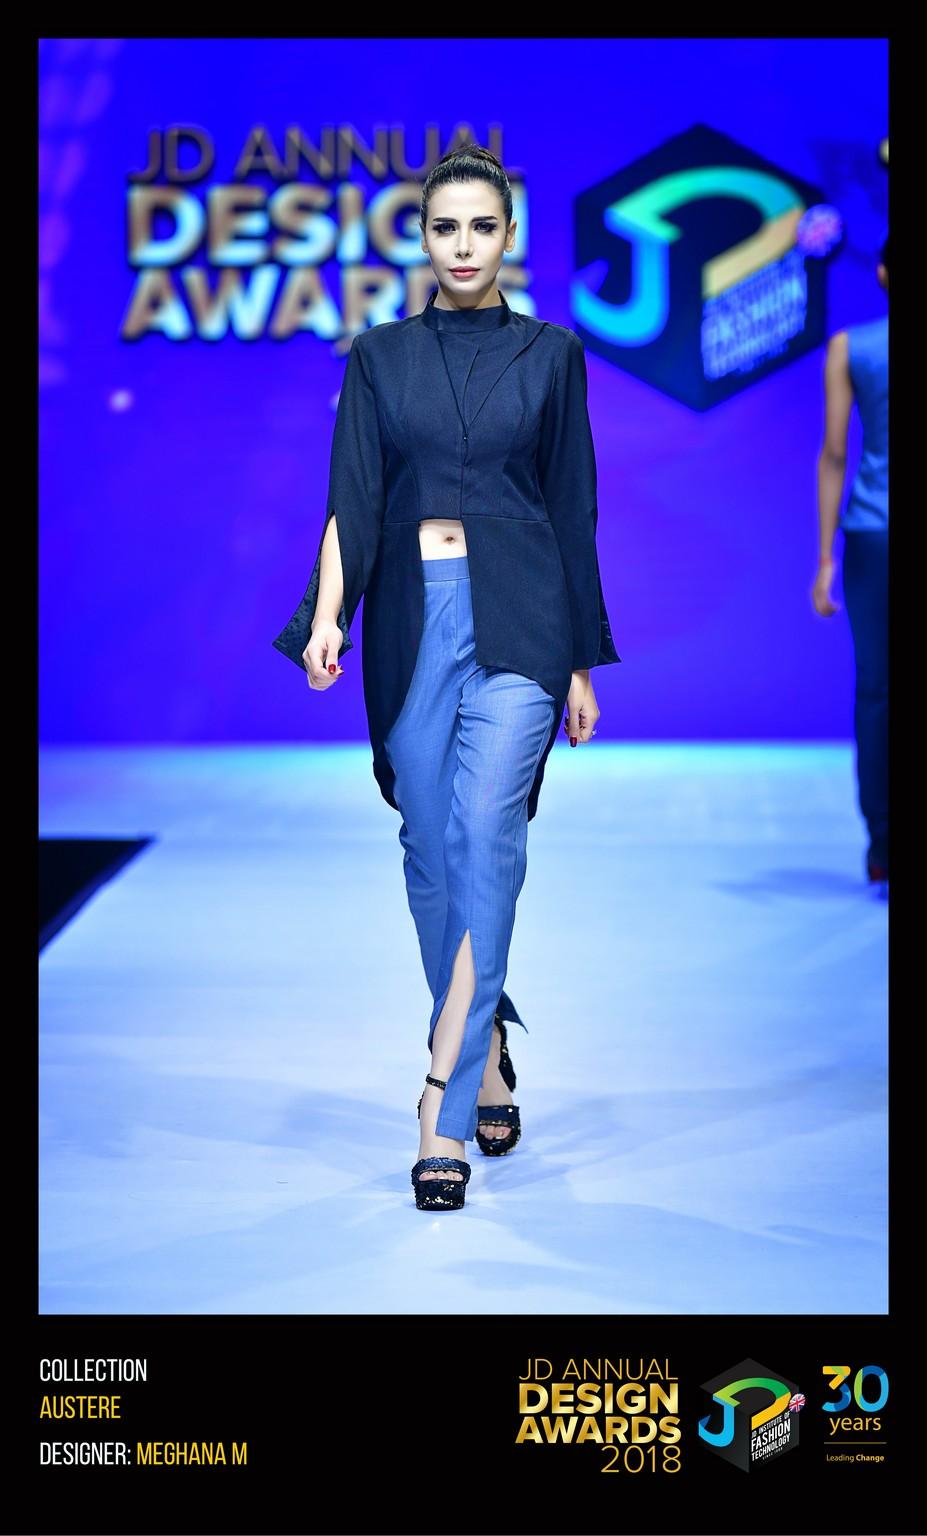 Austere – Change – JD Annual Design Awards 2018 | Designer: Meghana | Photography : Jerin Nath (@jerin_nath) austere - AUSTERE8 - Austere – Change – JD Annual Design Awards 2018